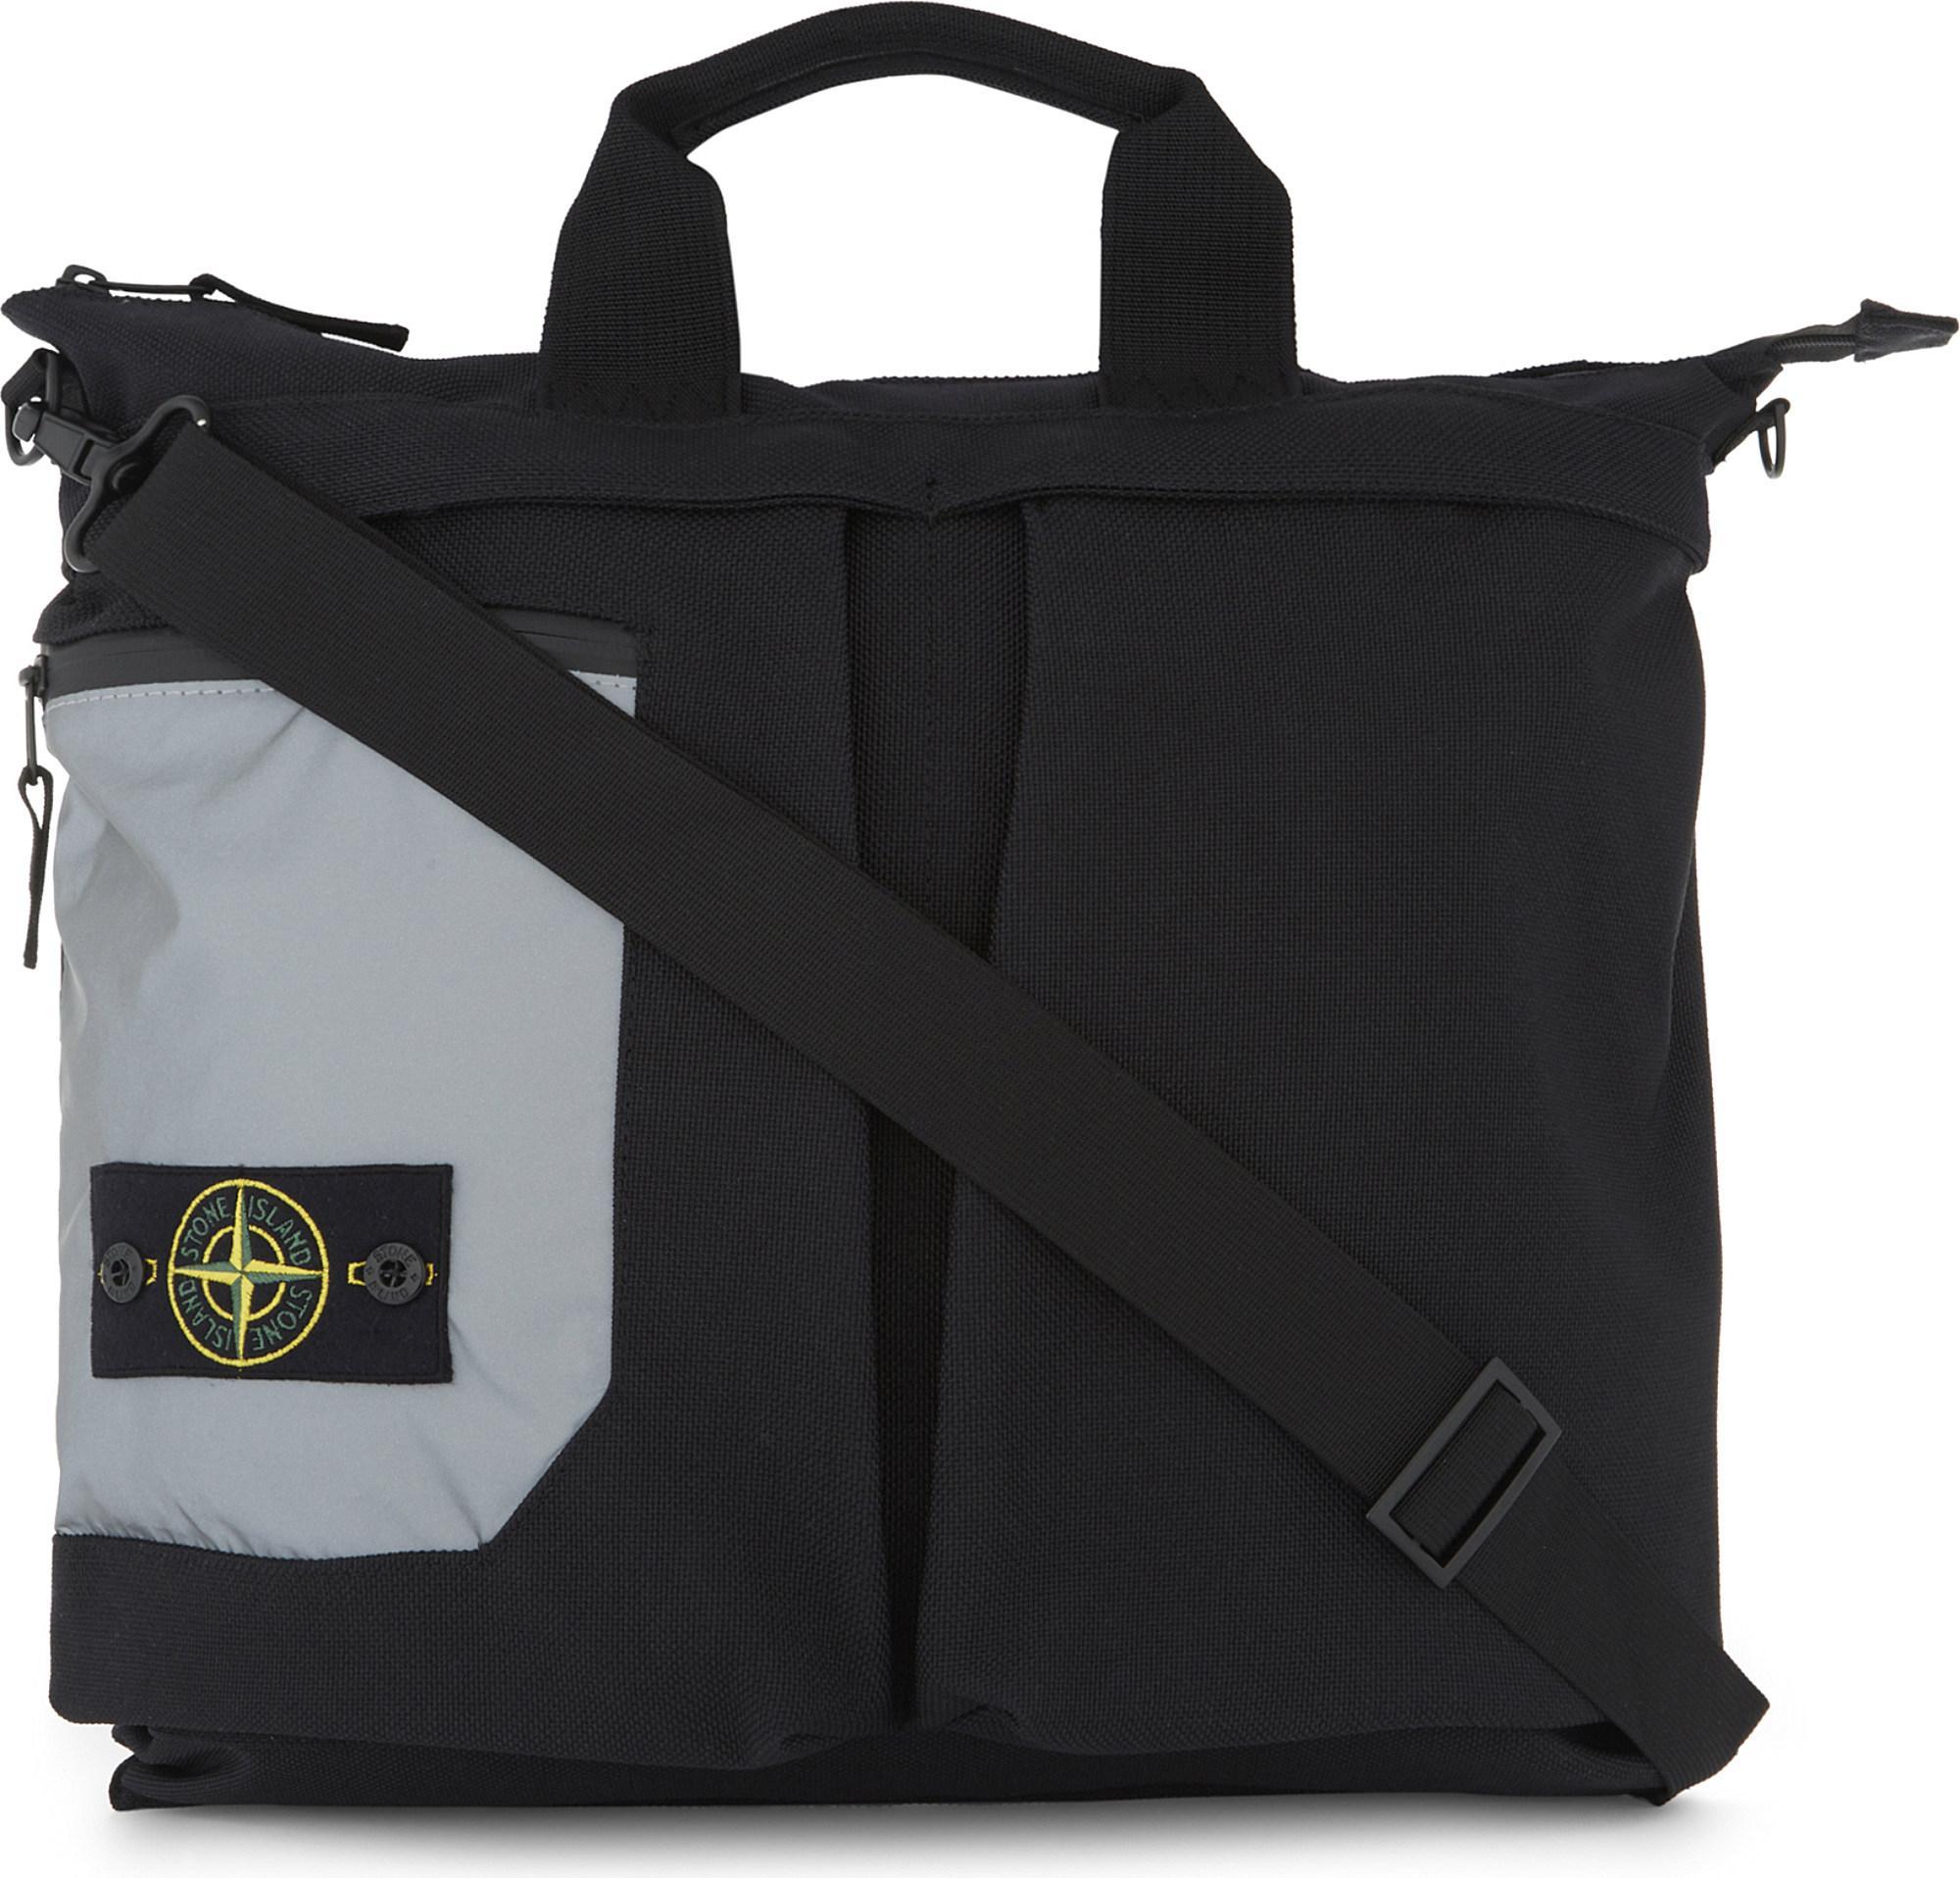 ffb8b130daaa Lyst - Stone Island Slim Nylon Tote Backpack in Black for Men